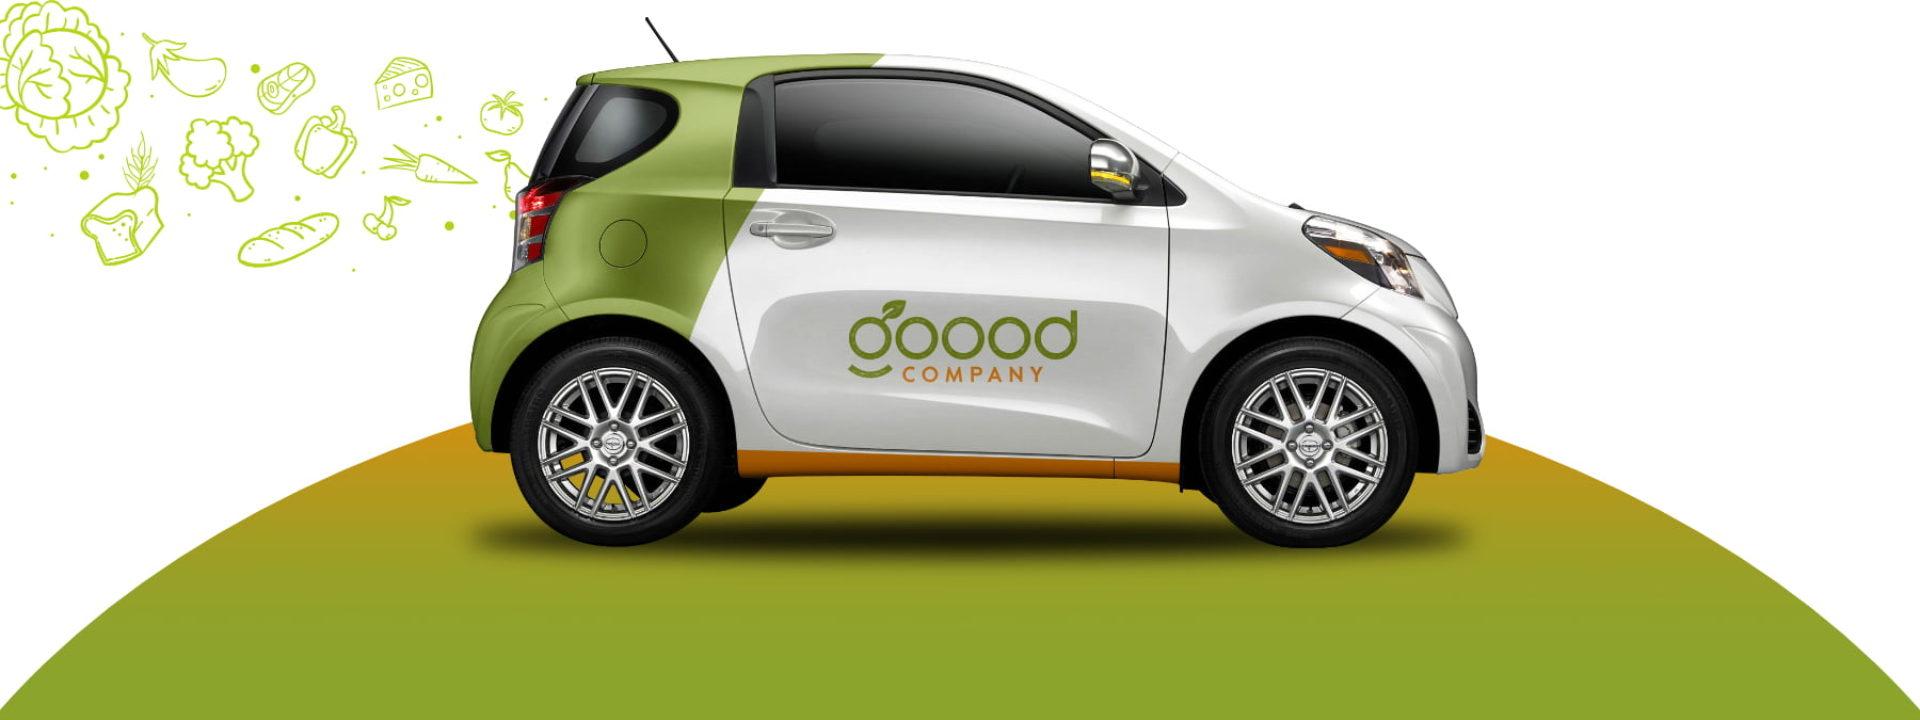 Goood electric car - Rene Verkaart)